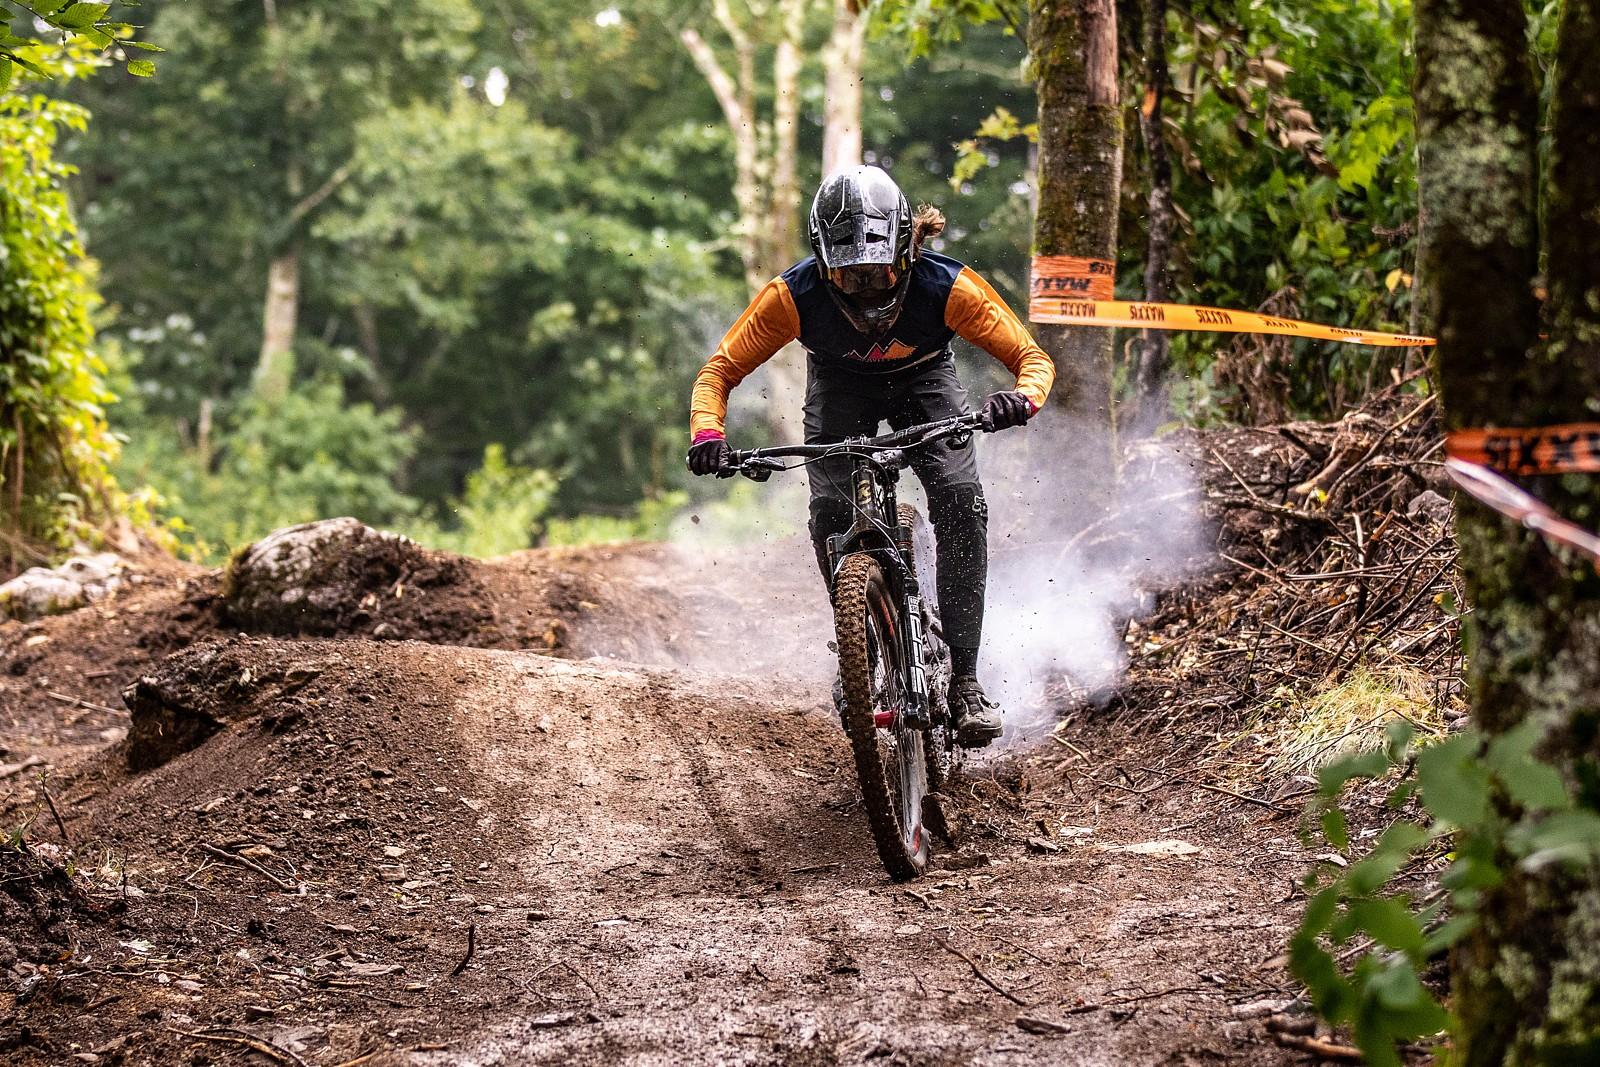 Race Report - Downhill Southeast Sugar Mtn - JackRice - Mountain Biking Pictures - Vital MTB